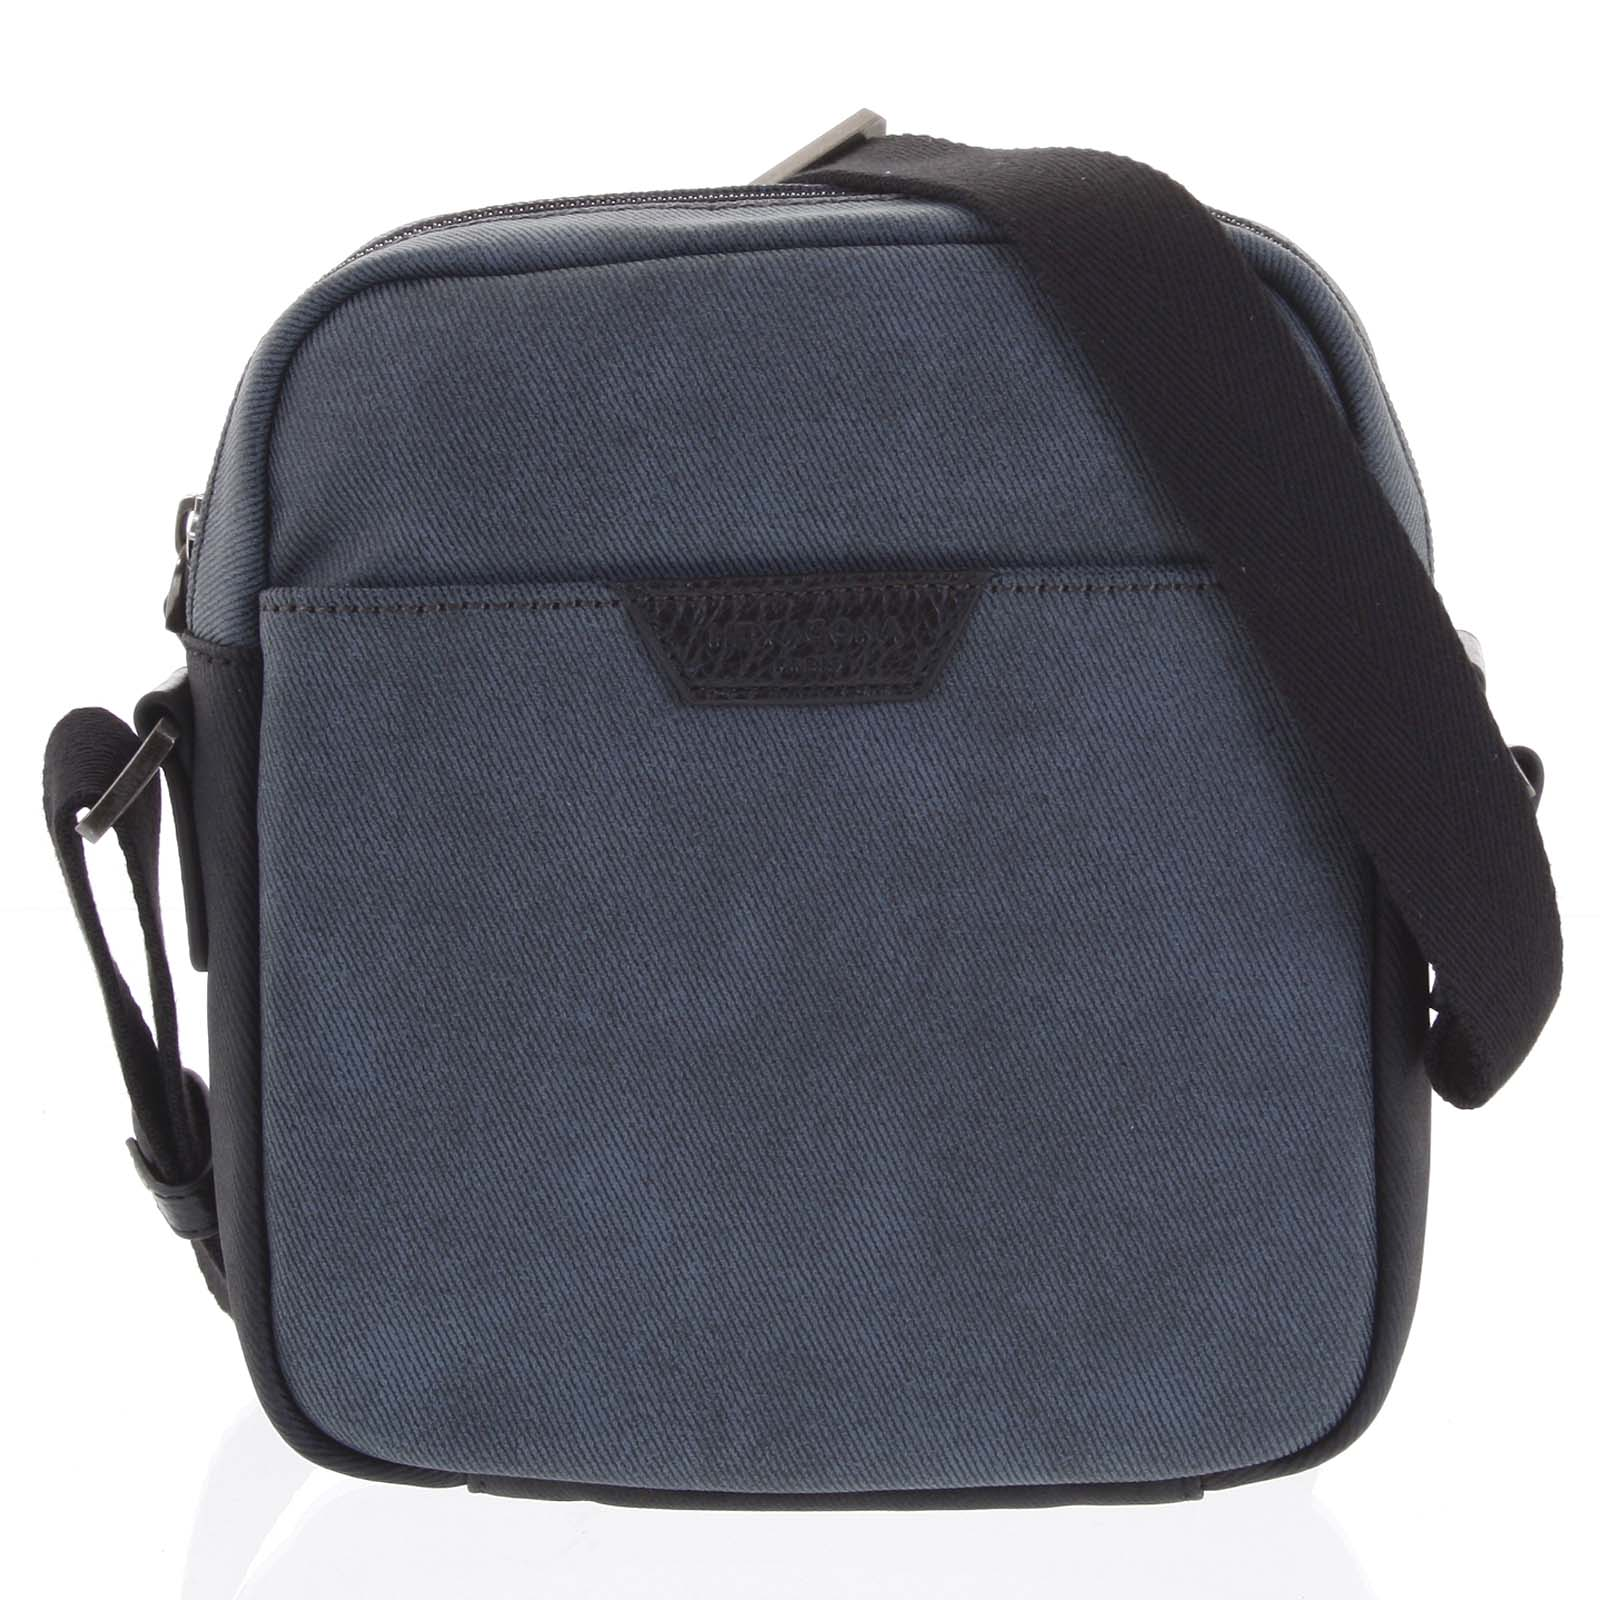 Pánská taška přes rameno modrá - Hexagona Clark